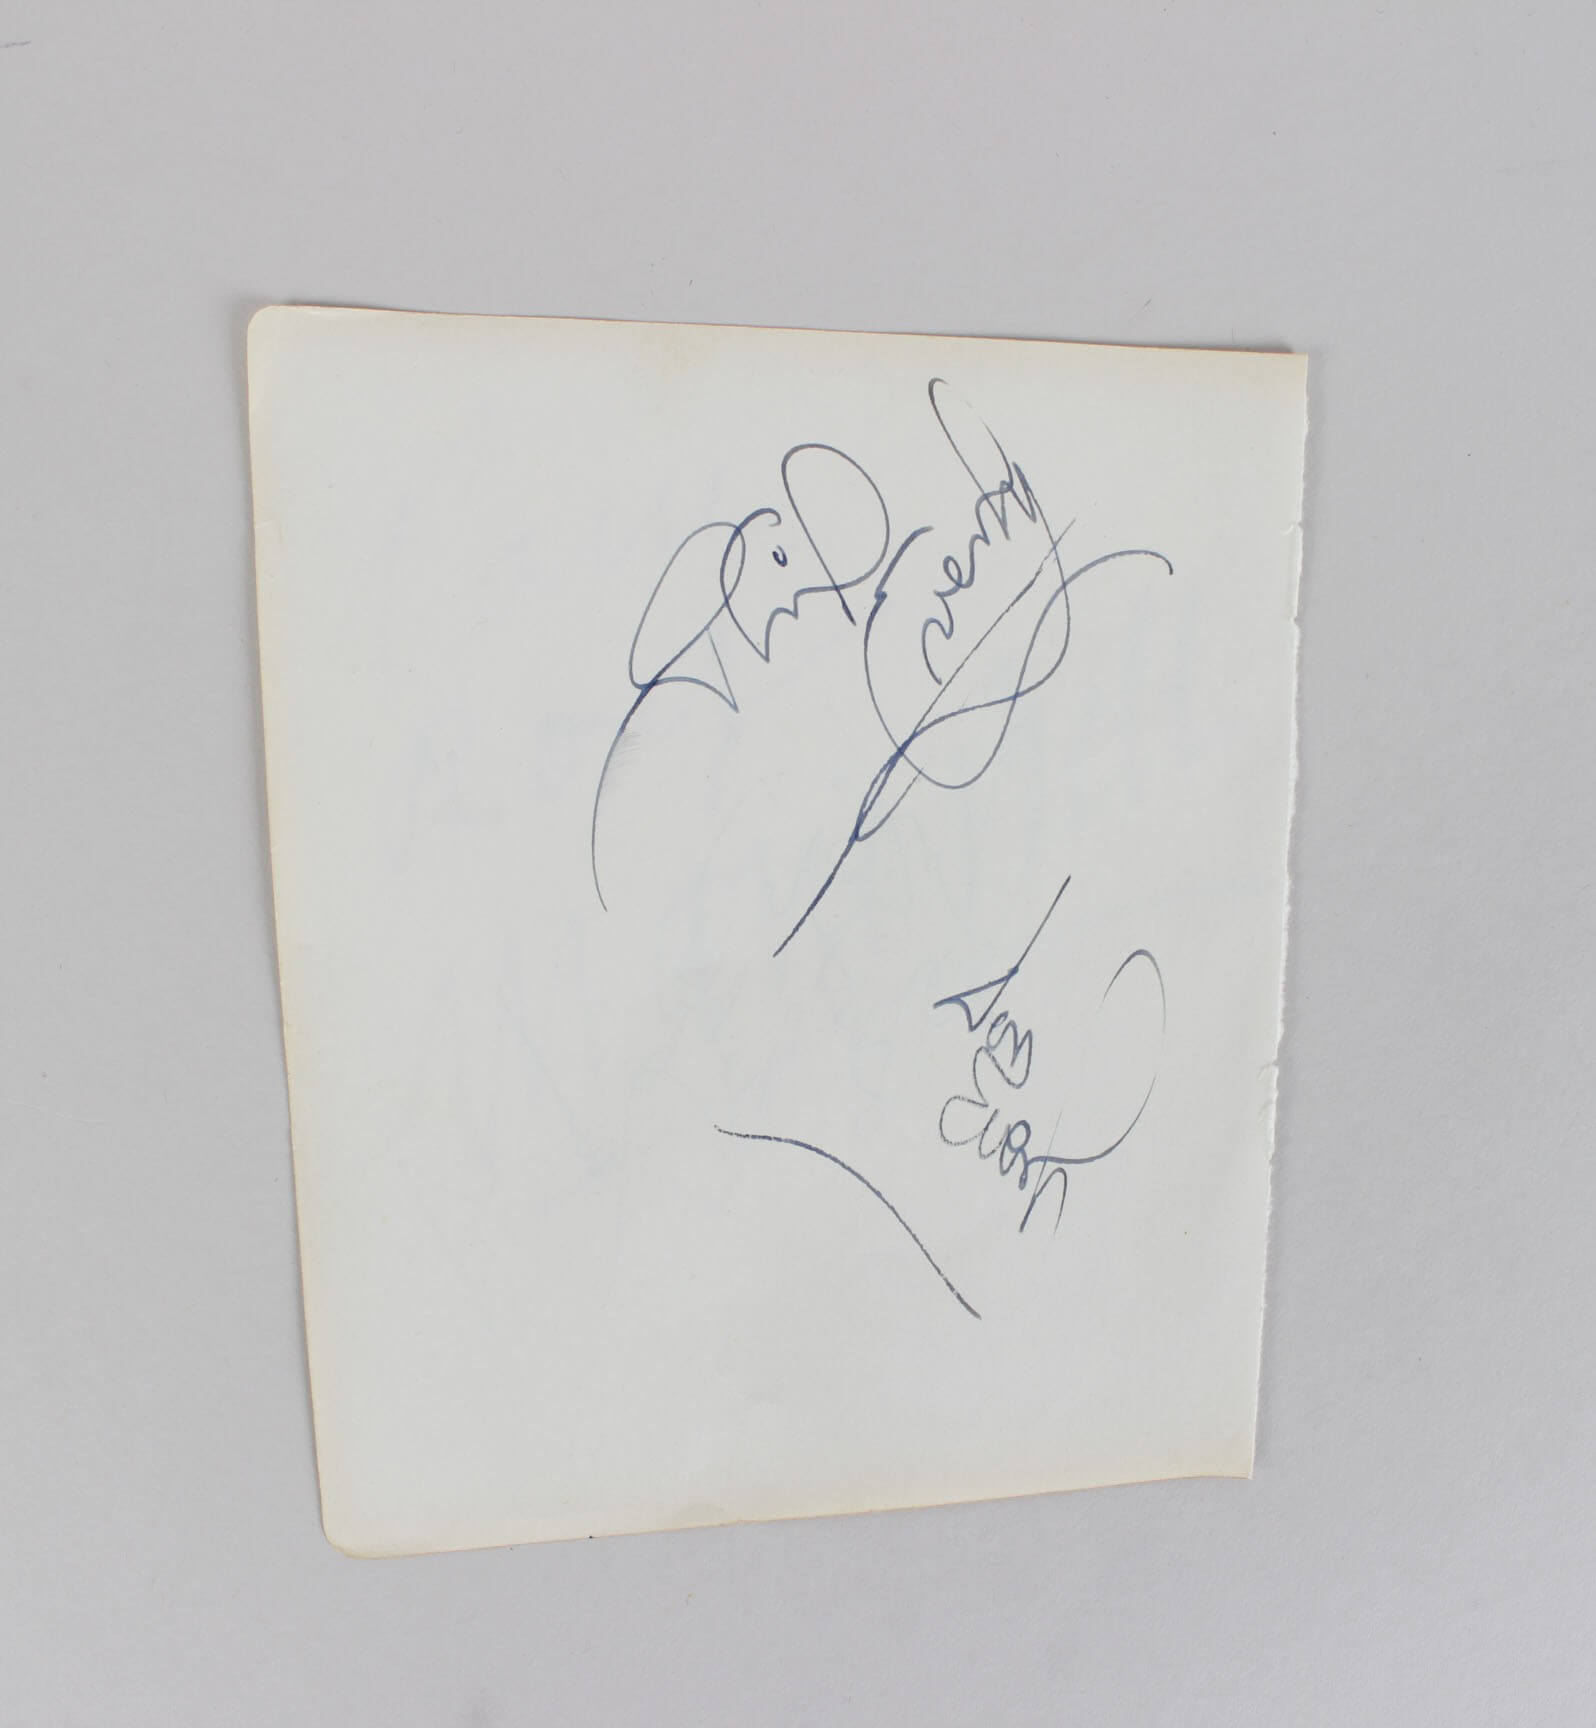 Entertainment Memorabilia Earnest Spencer Tracy Signed Album Page Coa Jsa Movies